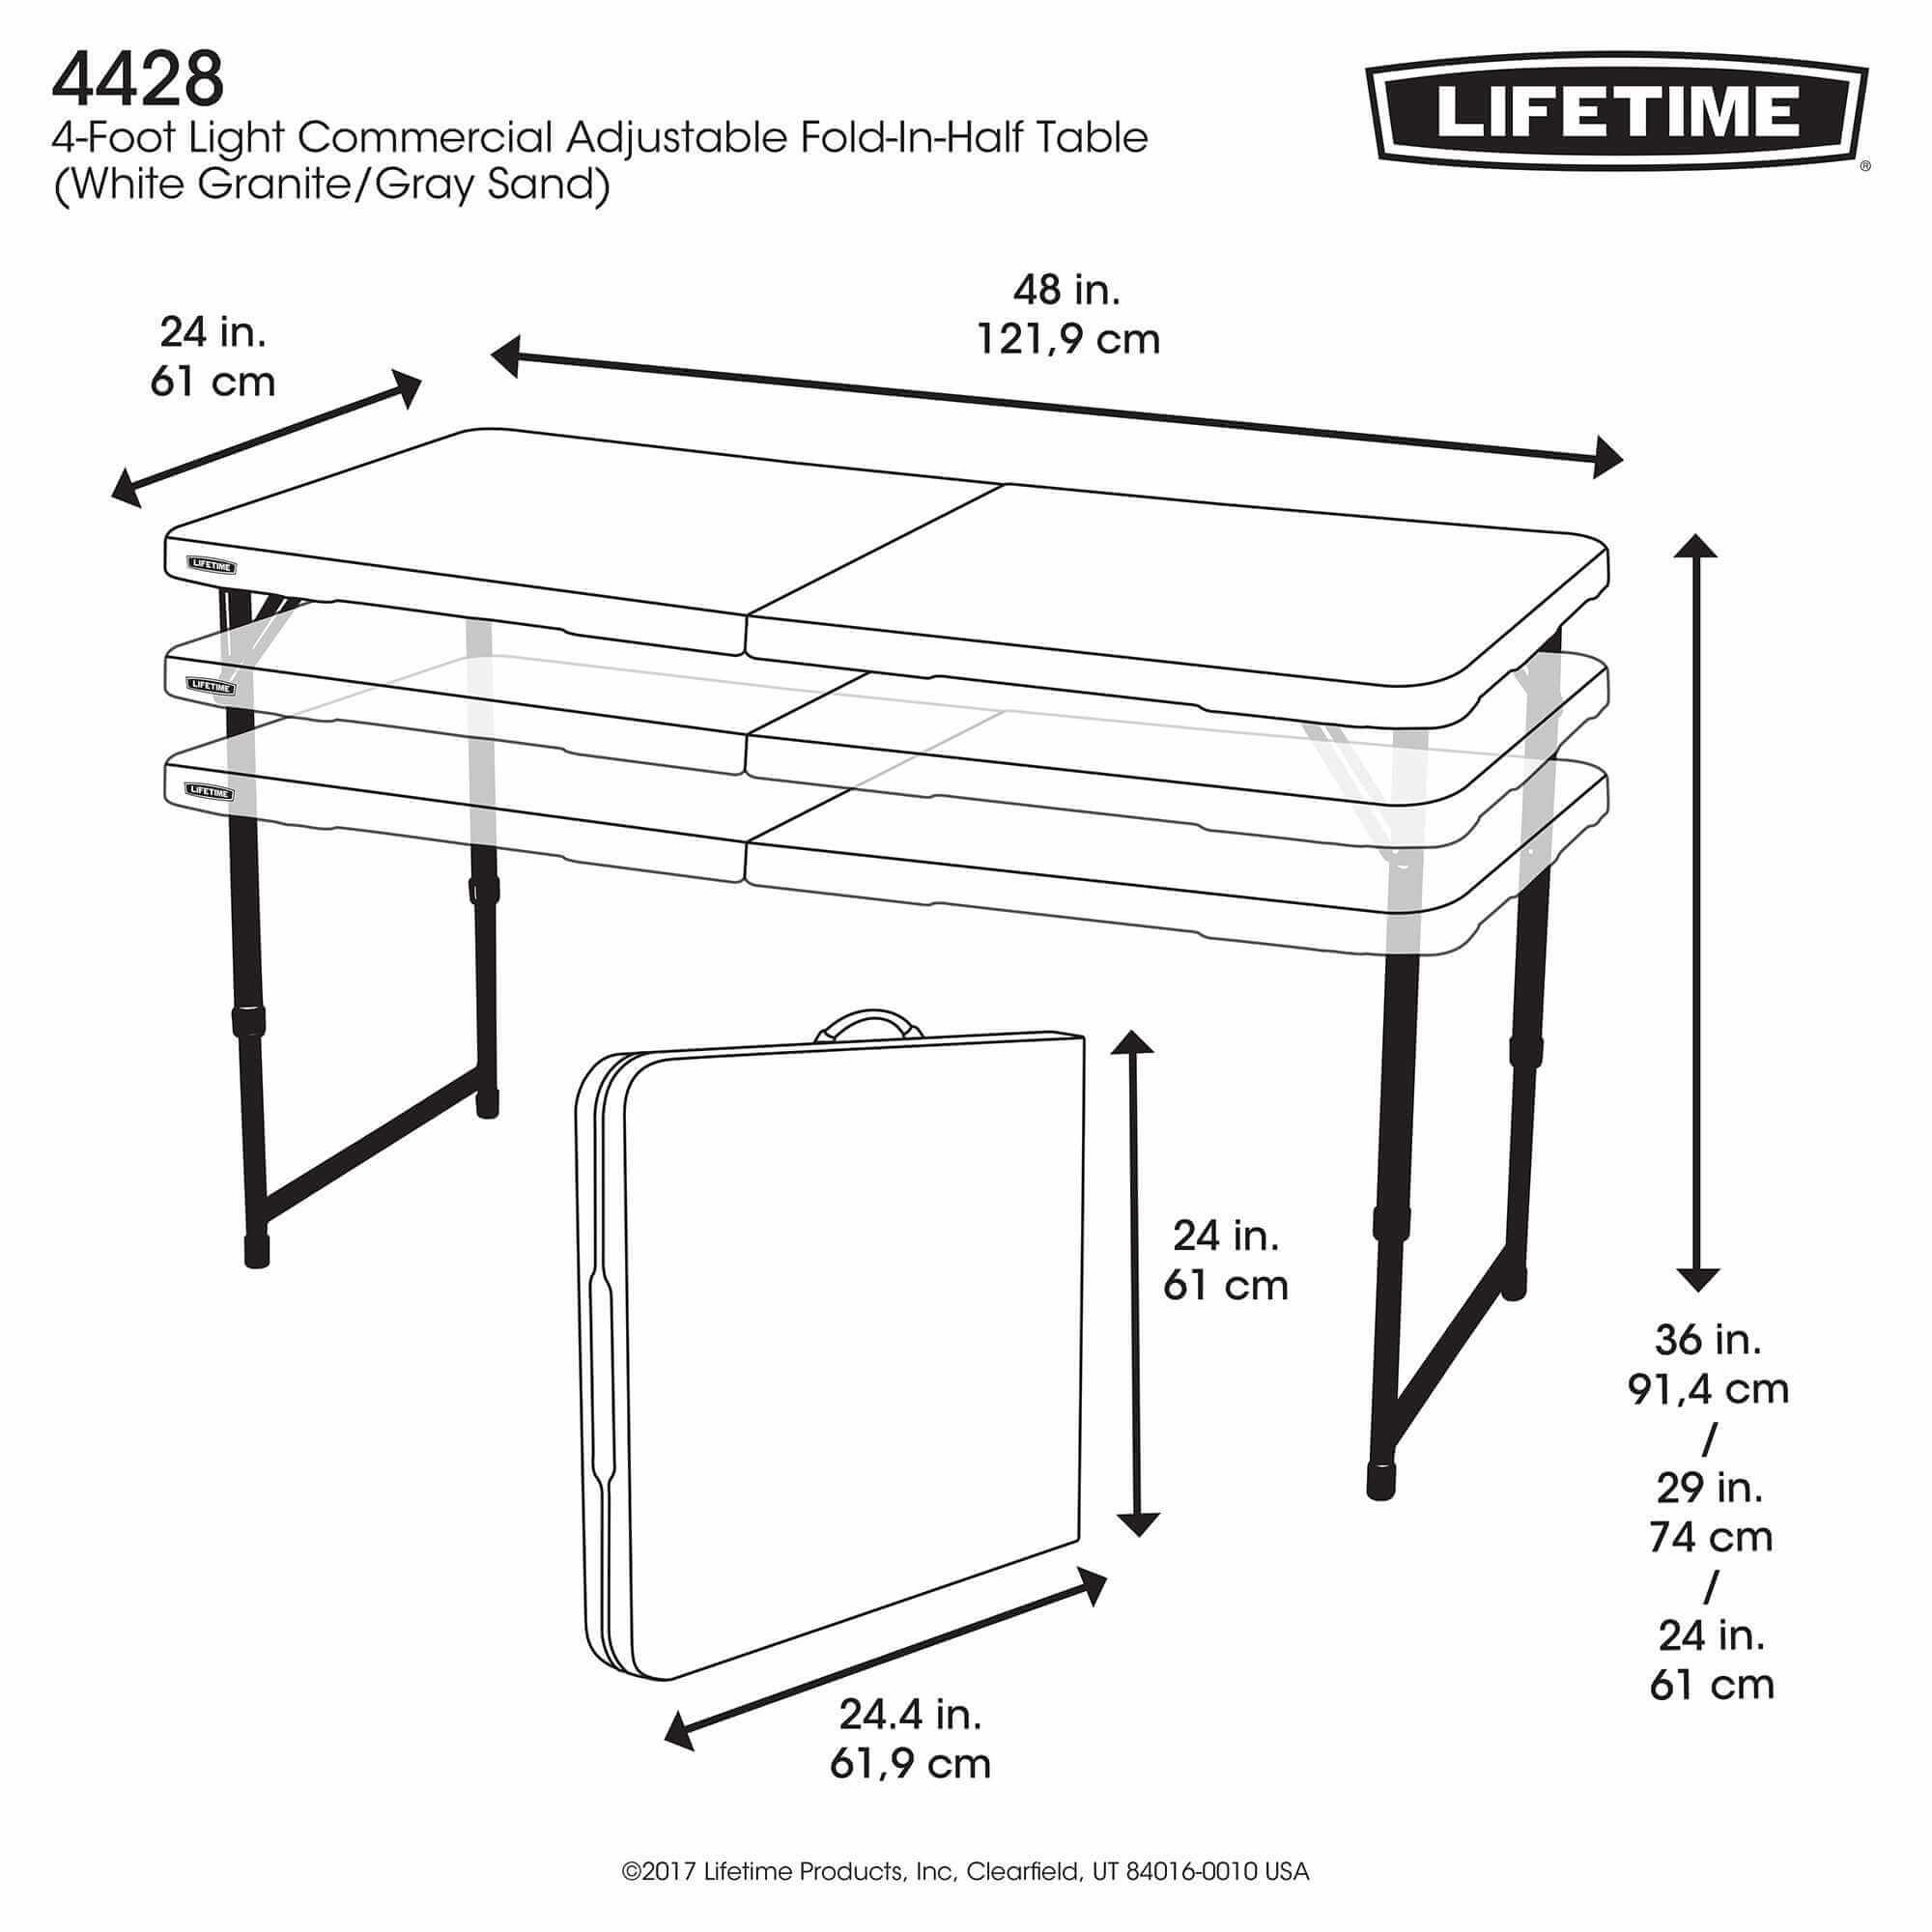 En Table En Rectangulaireblanc122cm Pliable Pliable Table Table 2valiseAjustable En 2valiseAjustable Rectangulaireblanc122cm Pliable WBoxerdC